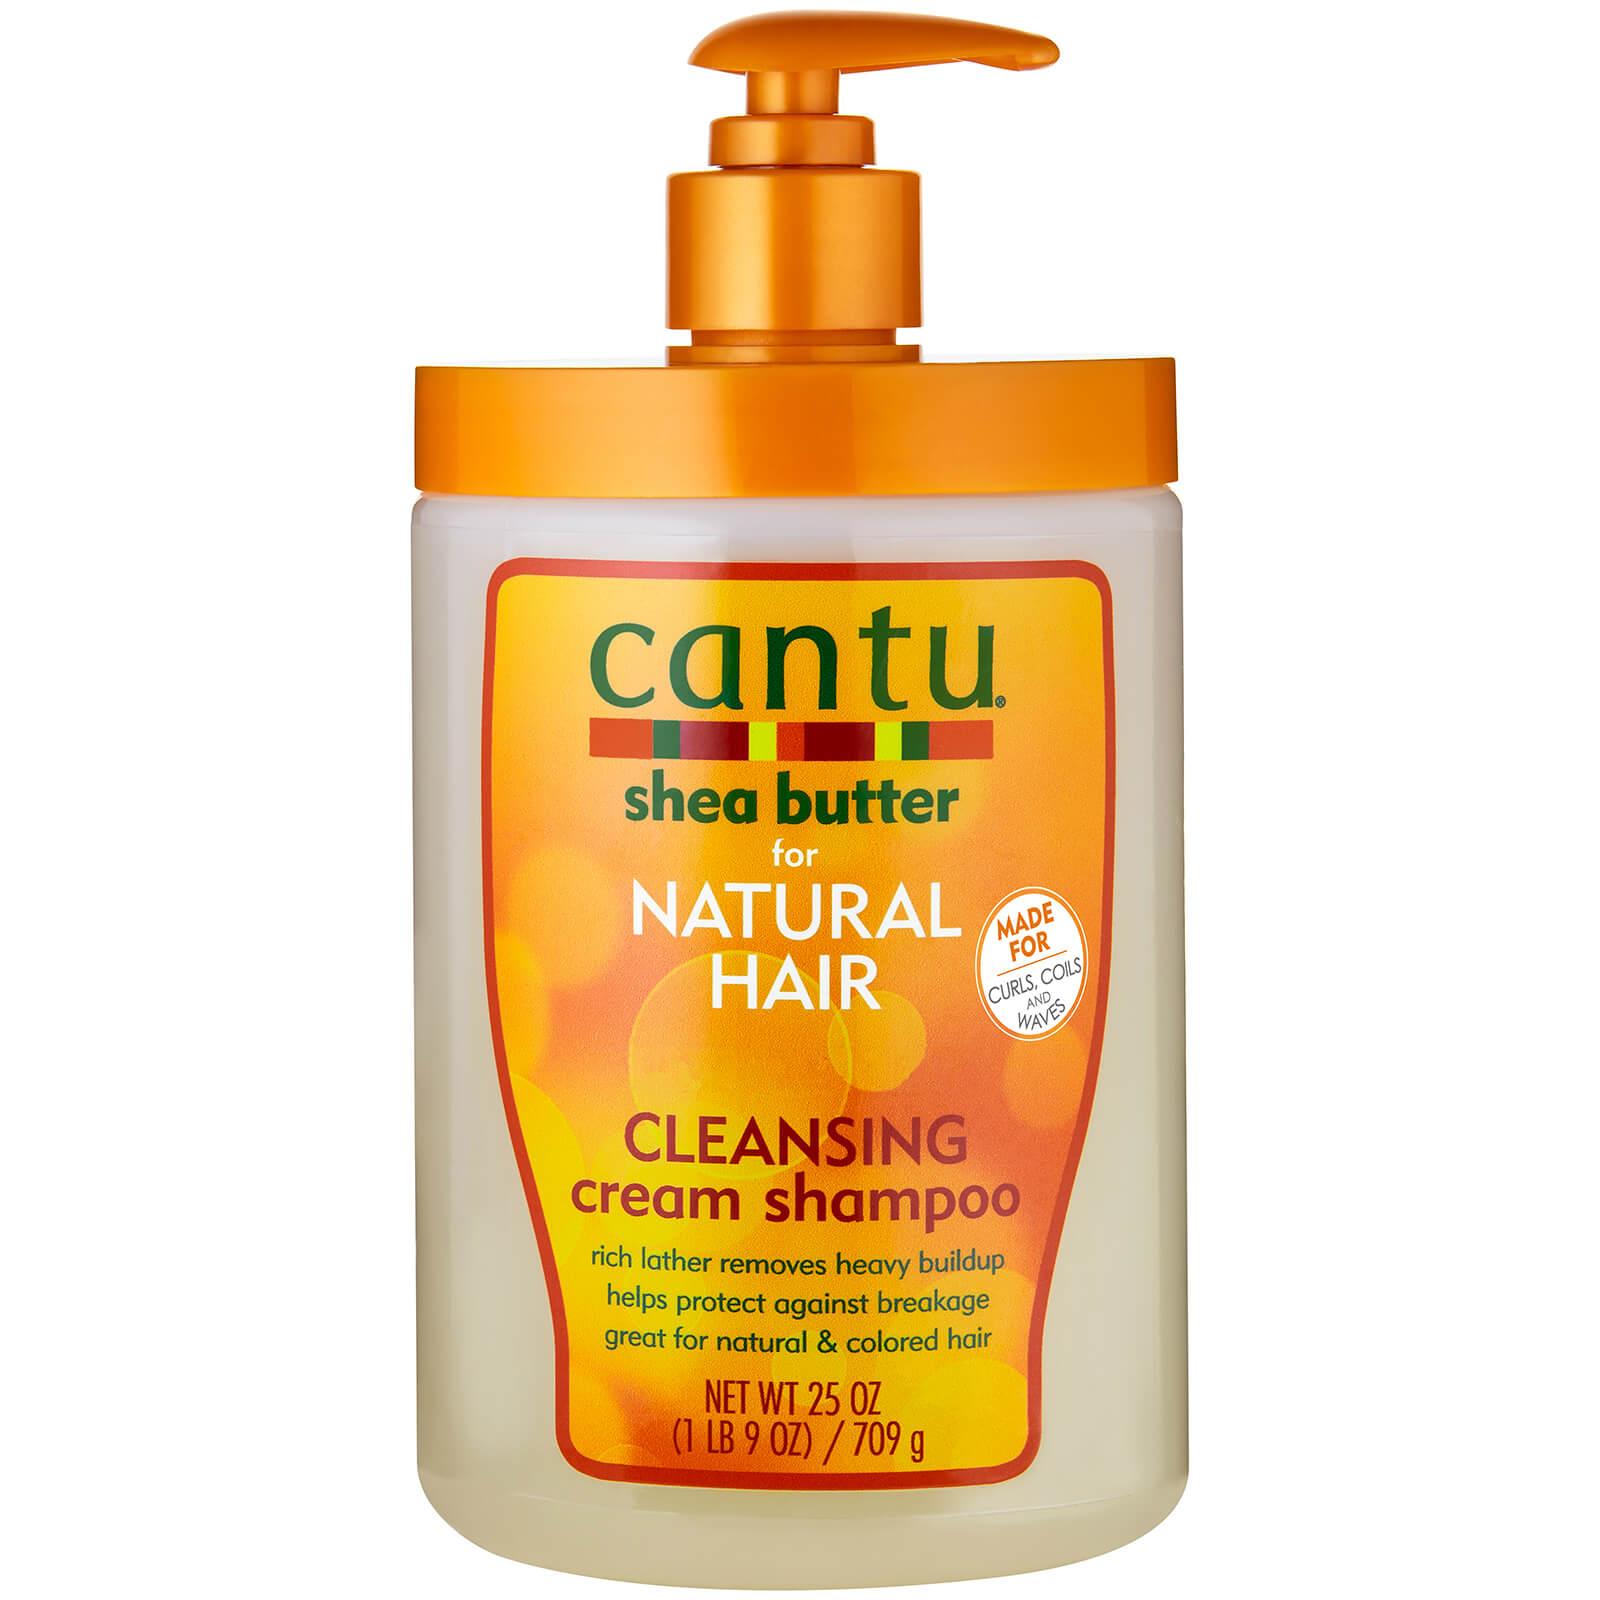 Купить Cantu Shea Butter for Natural Hair Cleansing Cream Shampoo – Salon Size 25 oz